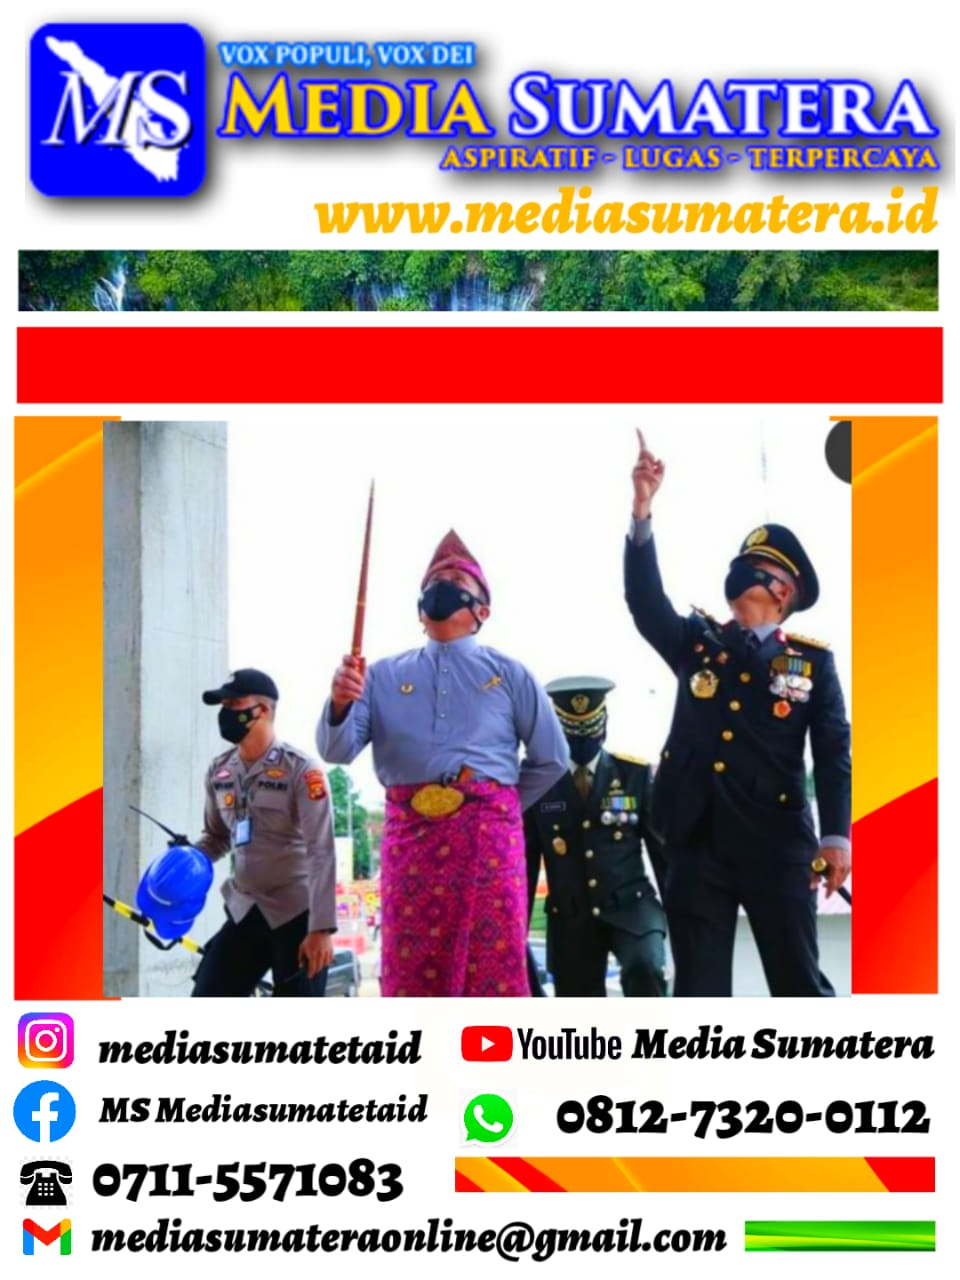 Kapolda Sumsel Irjen Pol Prof Eko Indra Heri, Bersama Forkompimda Sumsel Meninjau Pembangunan Gedung Mapolda Sumsel